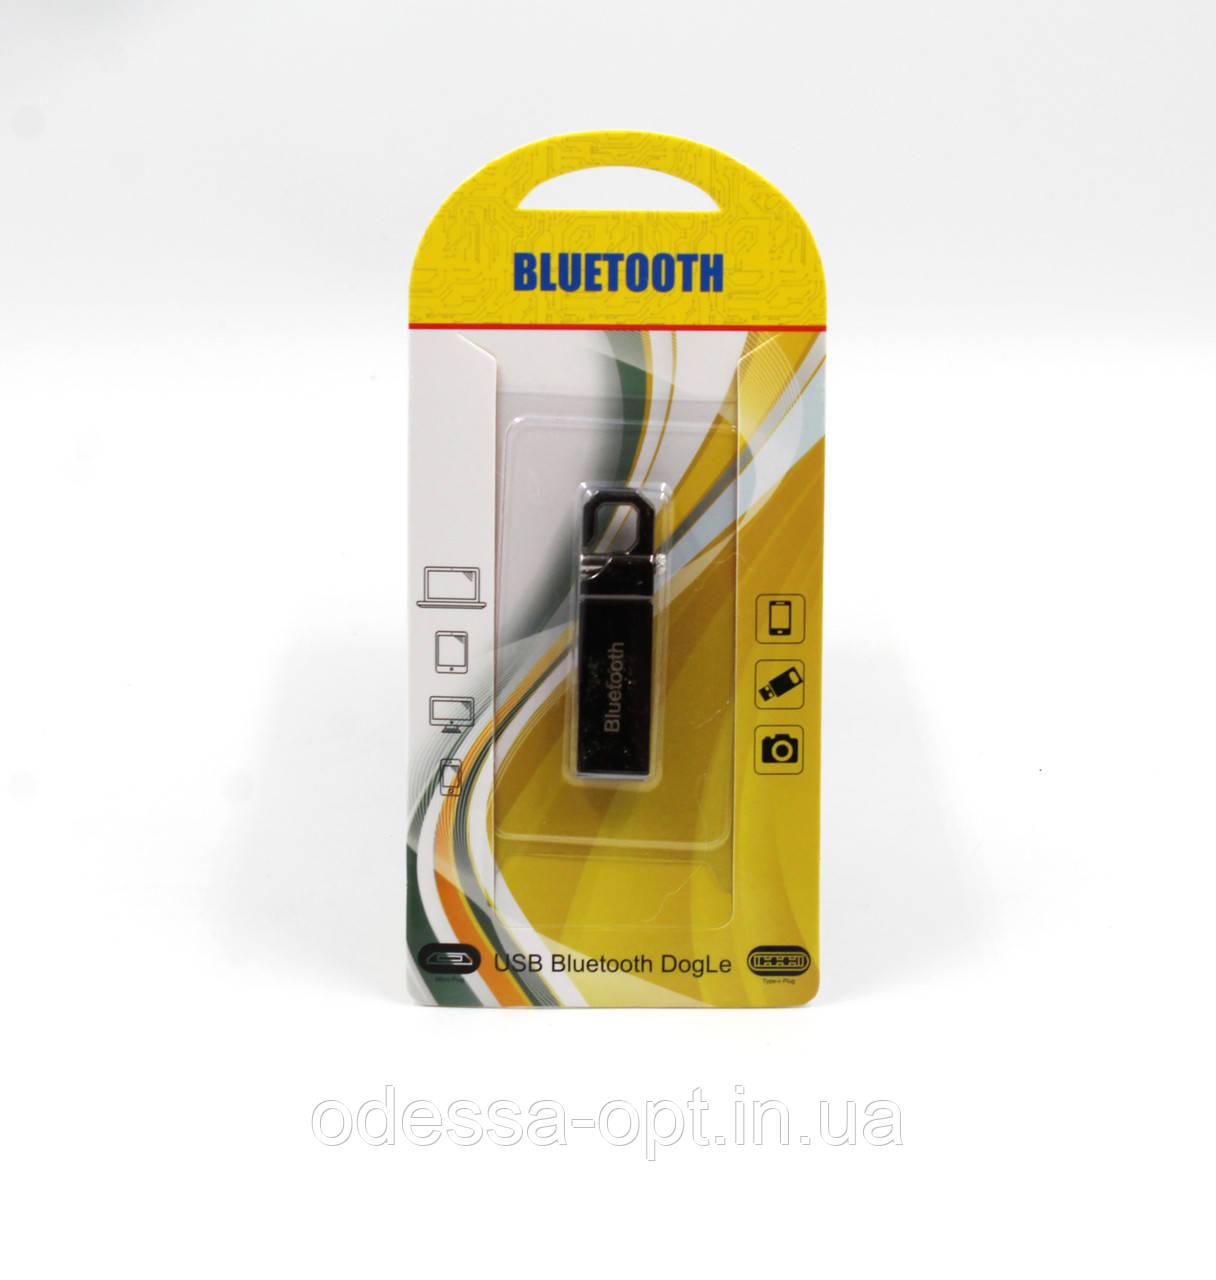 Трансмитер Bluetooth USB 580B